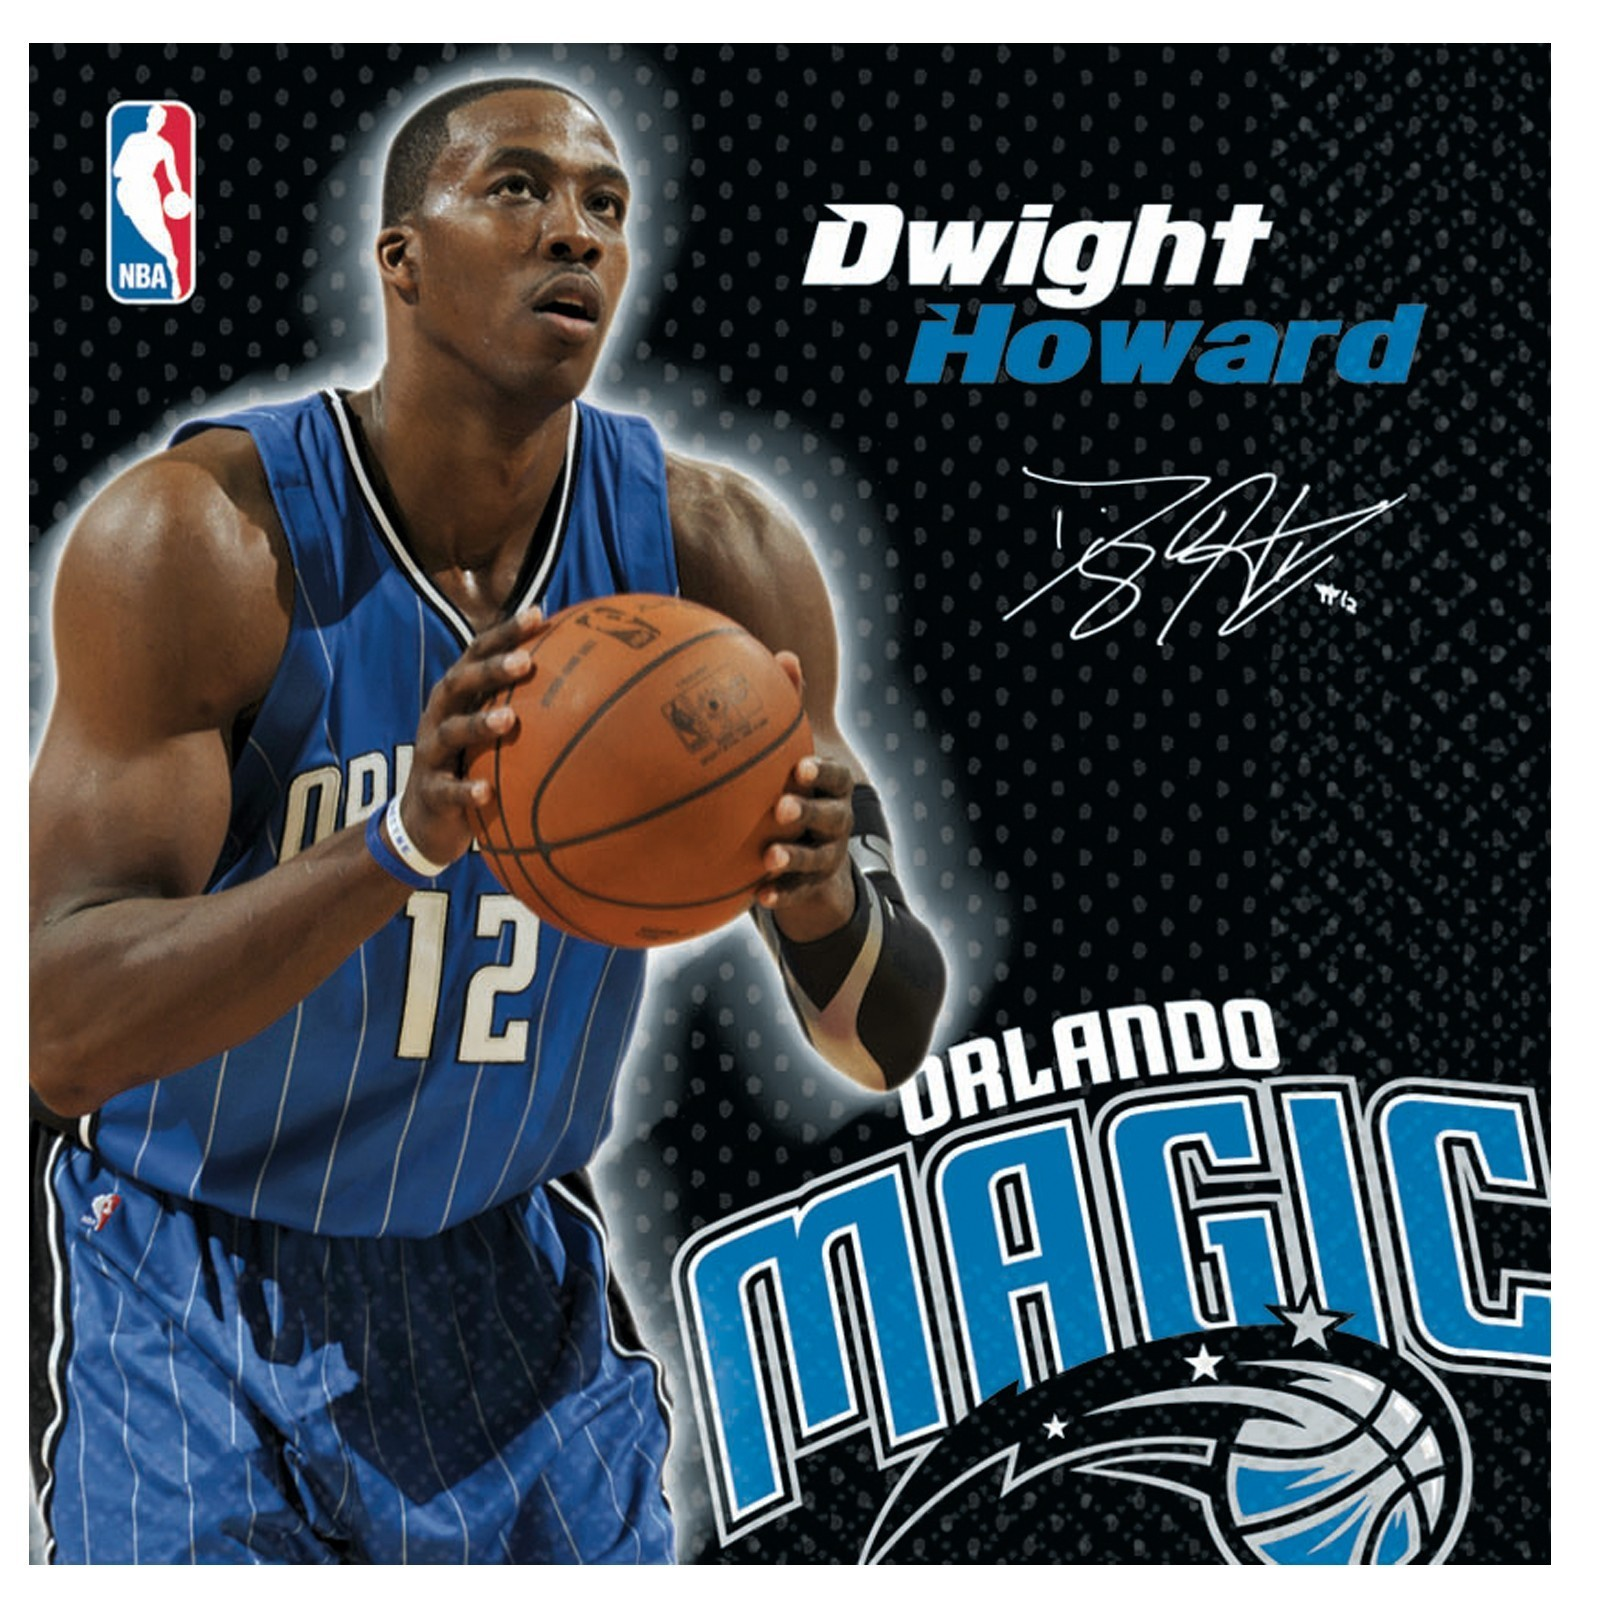 NBA Dwight Howard Orlando Magic Lunch Napkins (16ct)